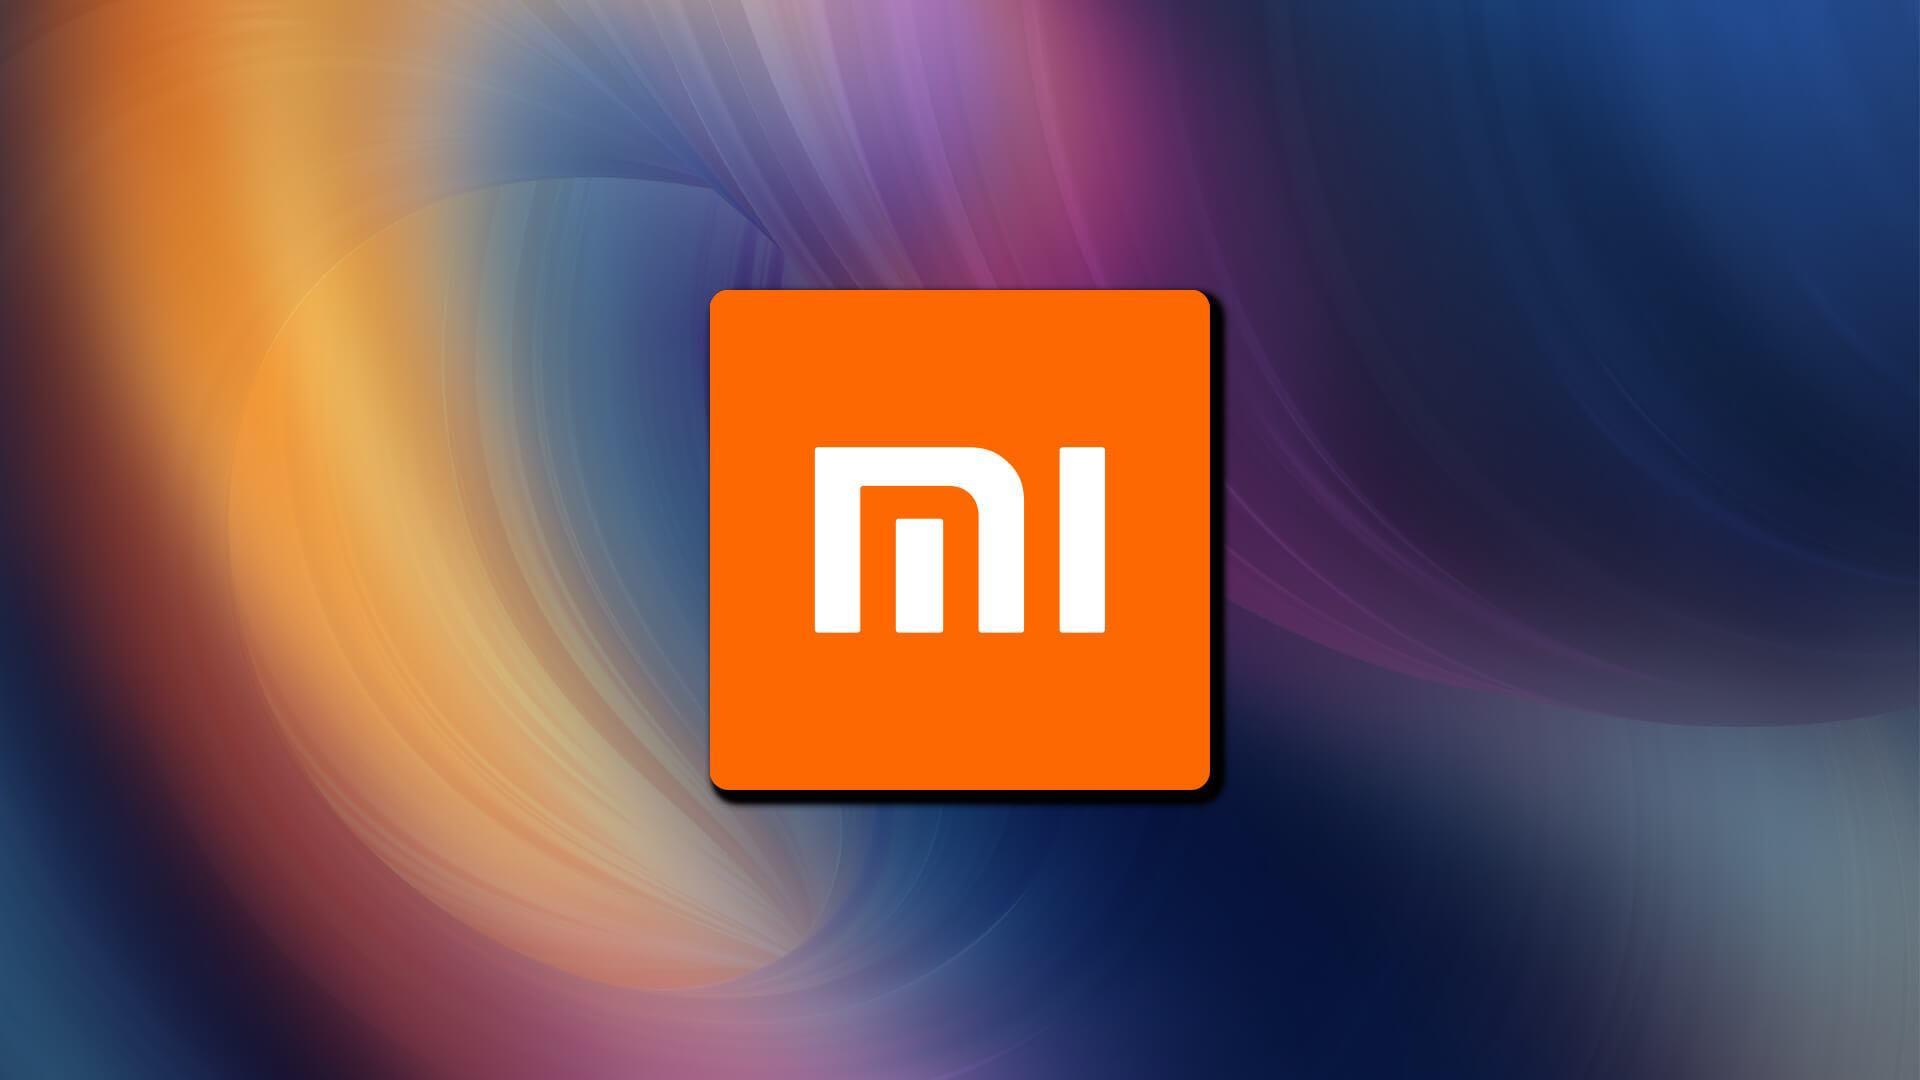 Xiaomi Mi 10 Ultra і Redmi K30 Ultra / Snapdragon 888 | створення електромобіля / найдешевший складаний смартфон / Great Wall